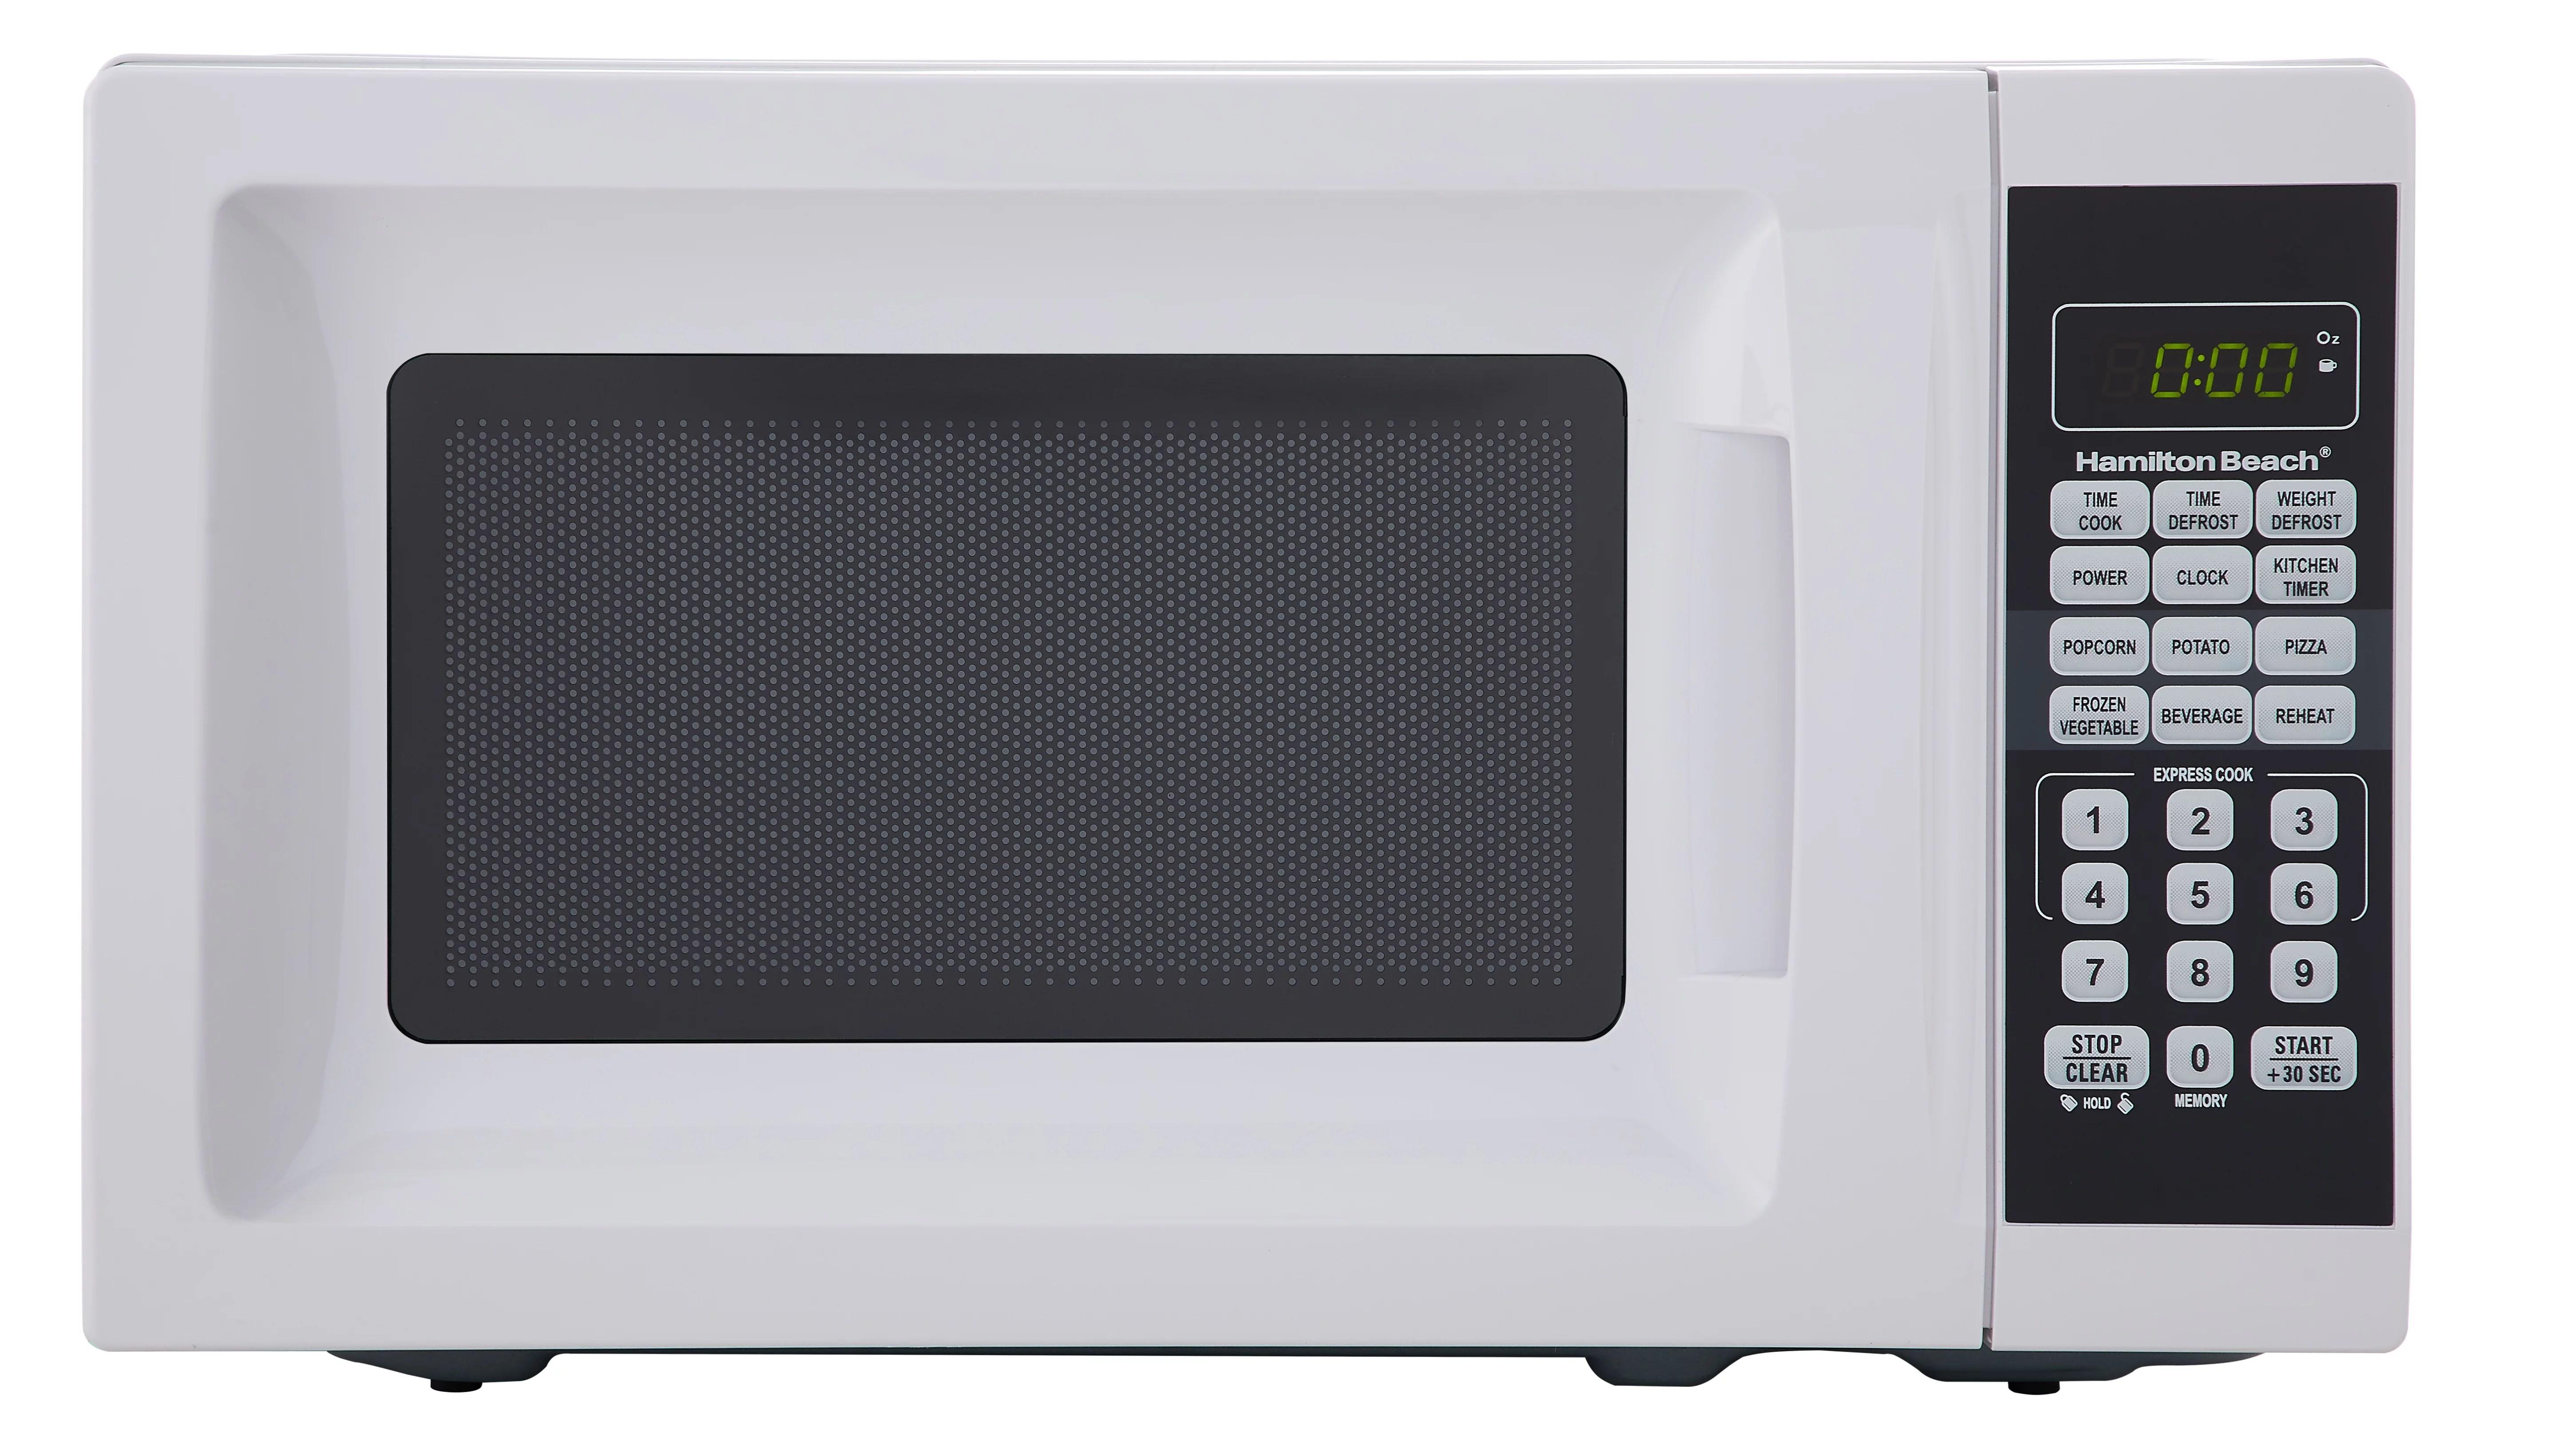 hamilton beach 0 7 cu ft white microwave oven